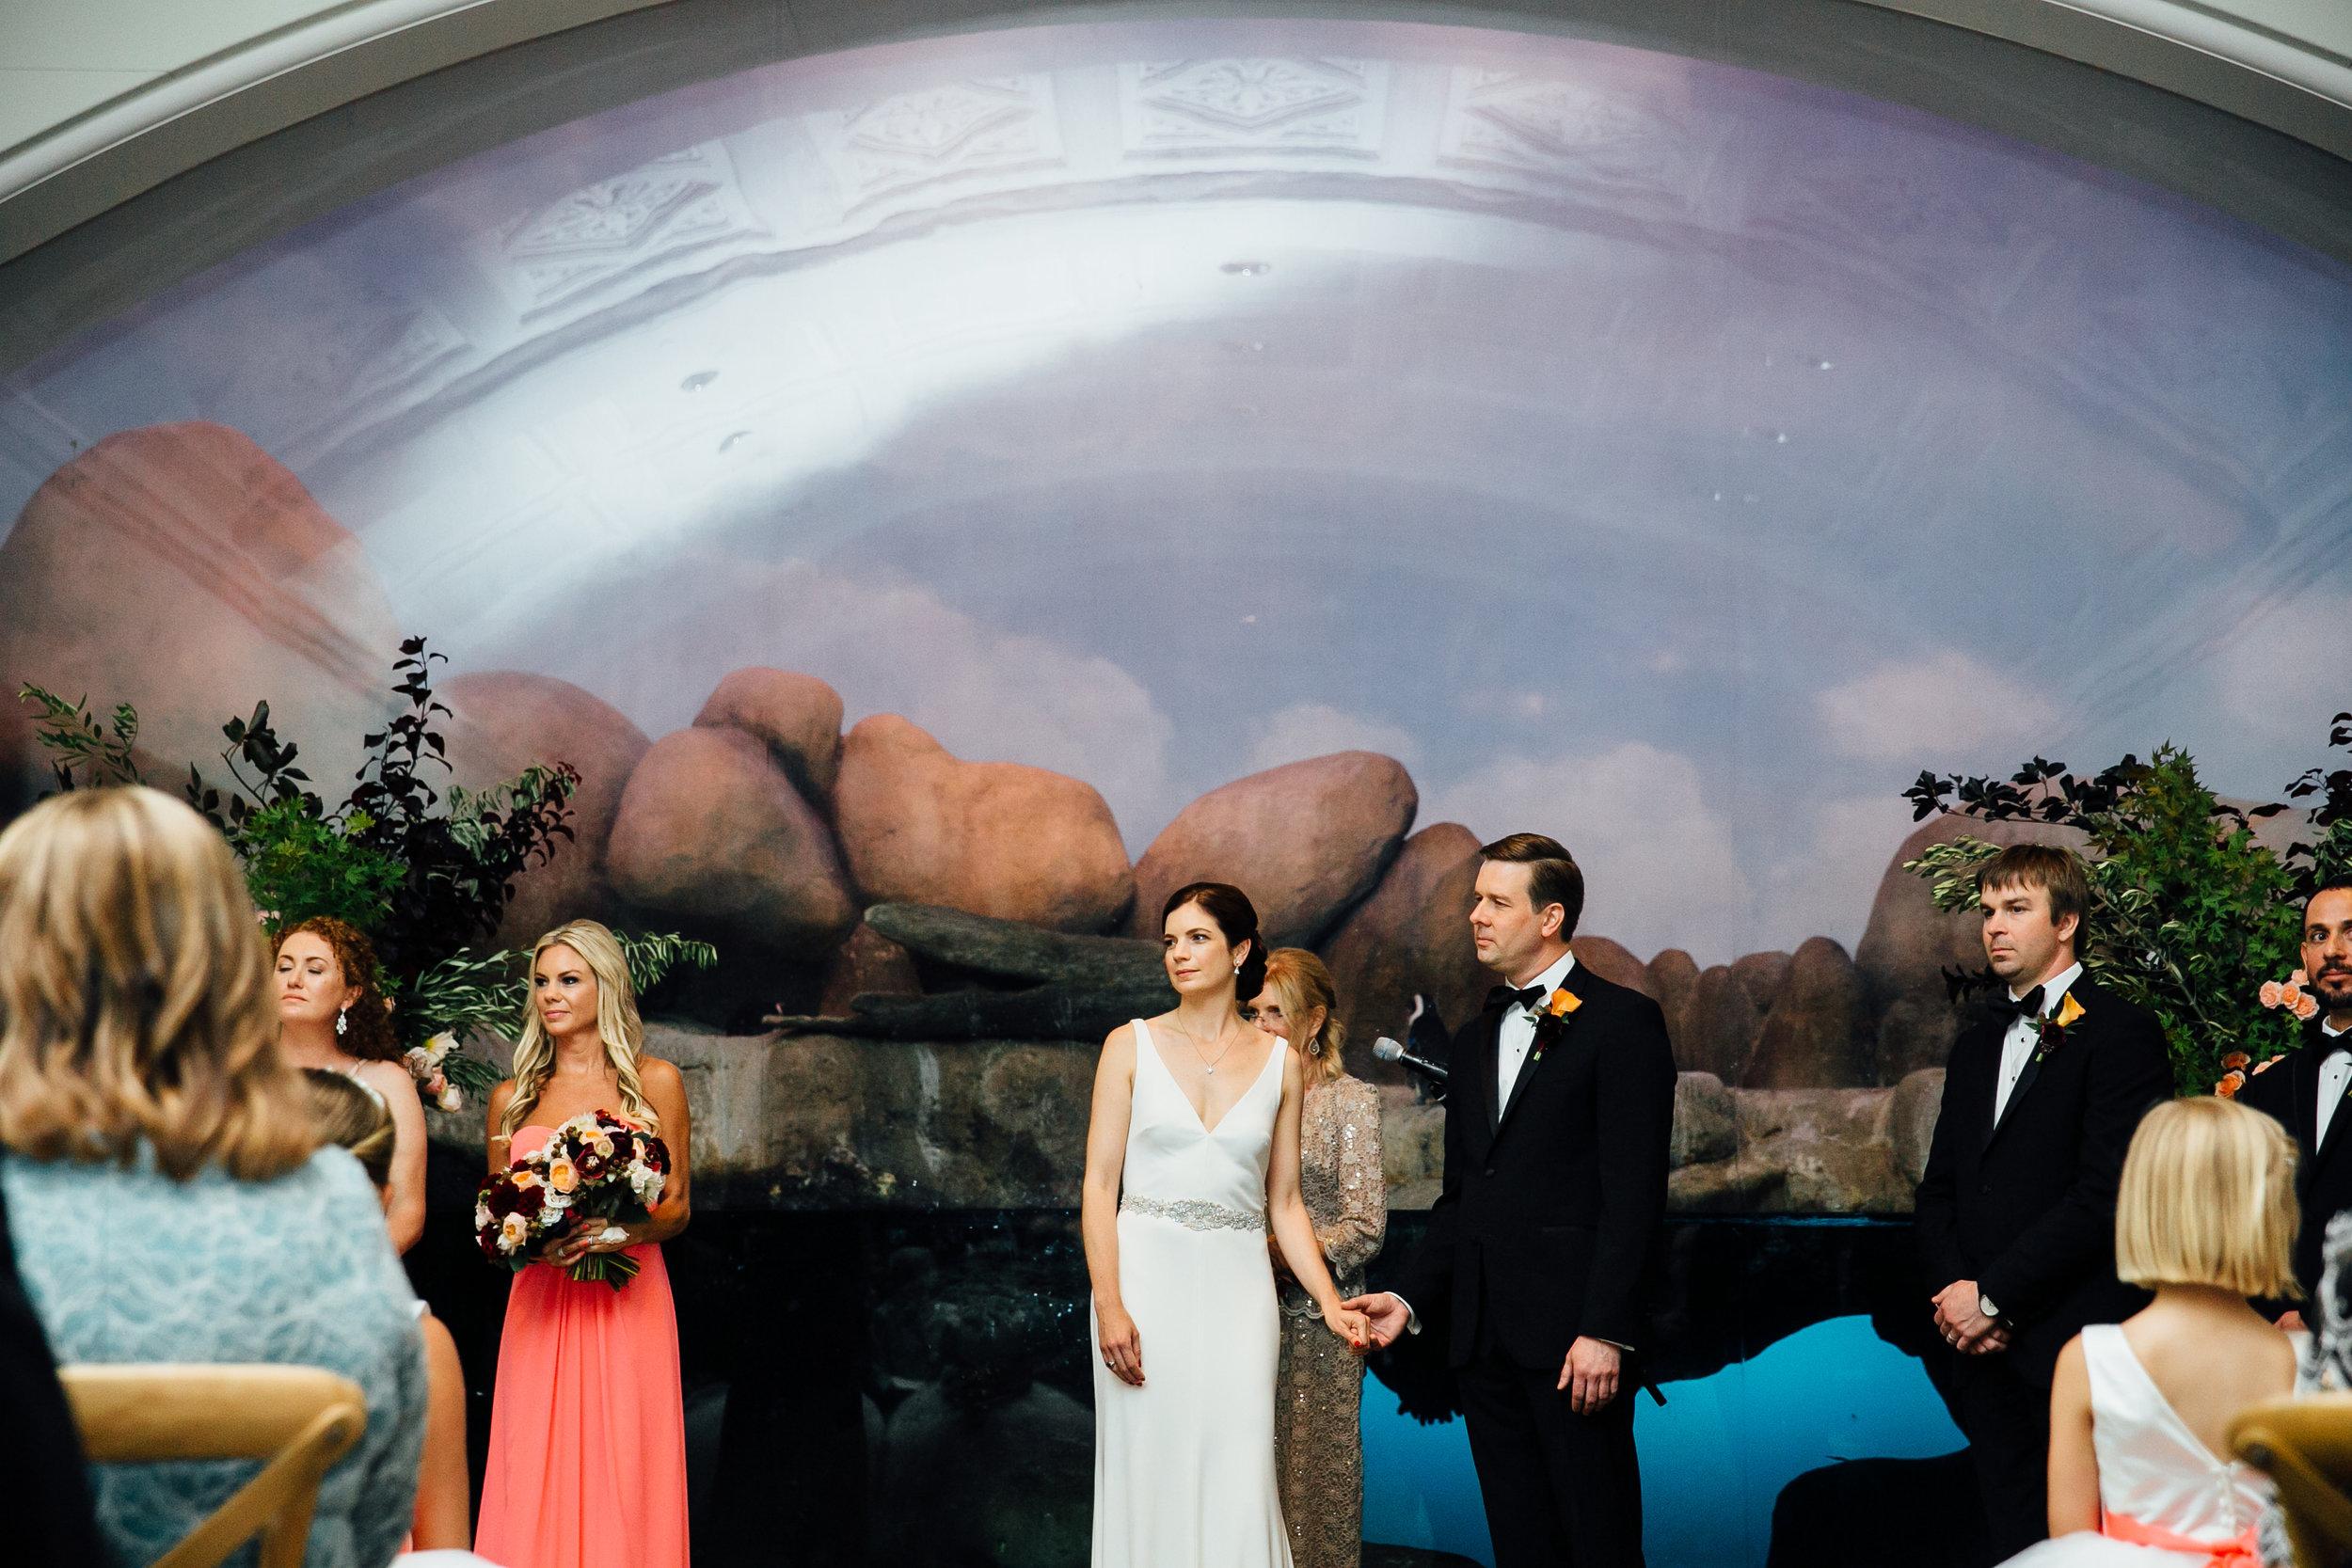 Wedding_KathleenMichael_Ceremony-180.jpg